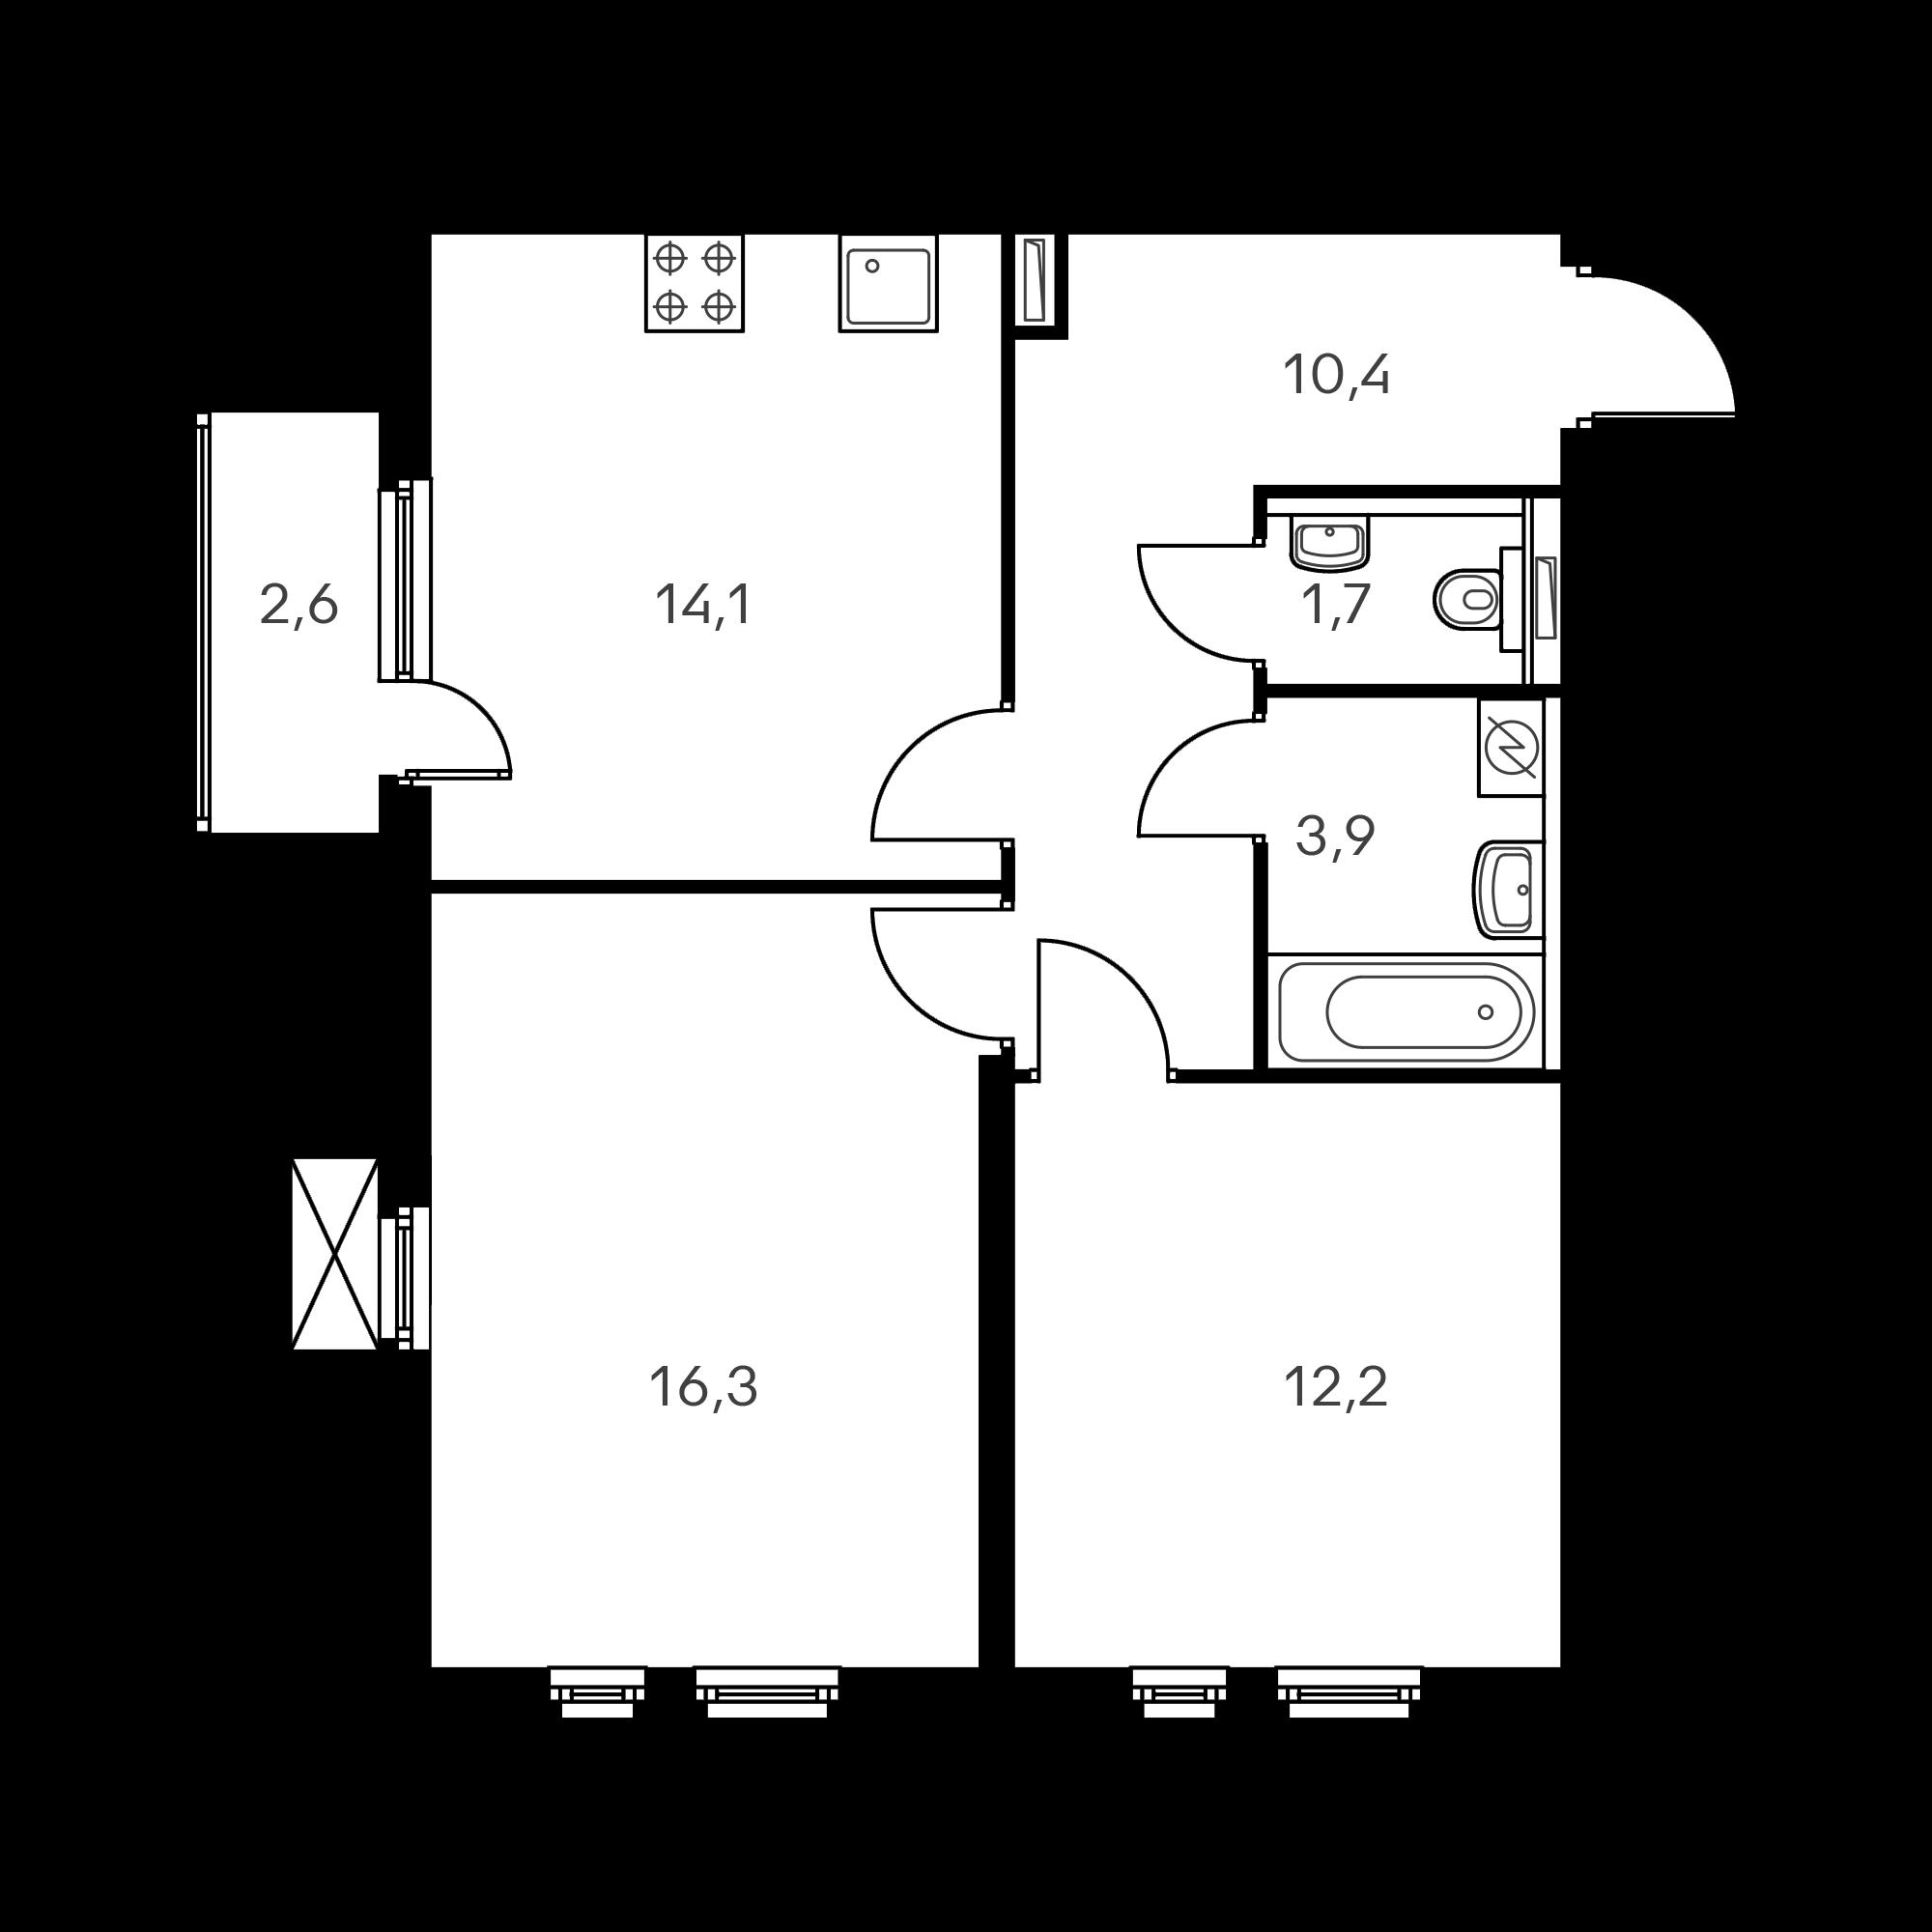 2KM1B_9.6-1SZ2